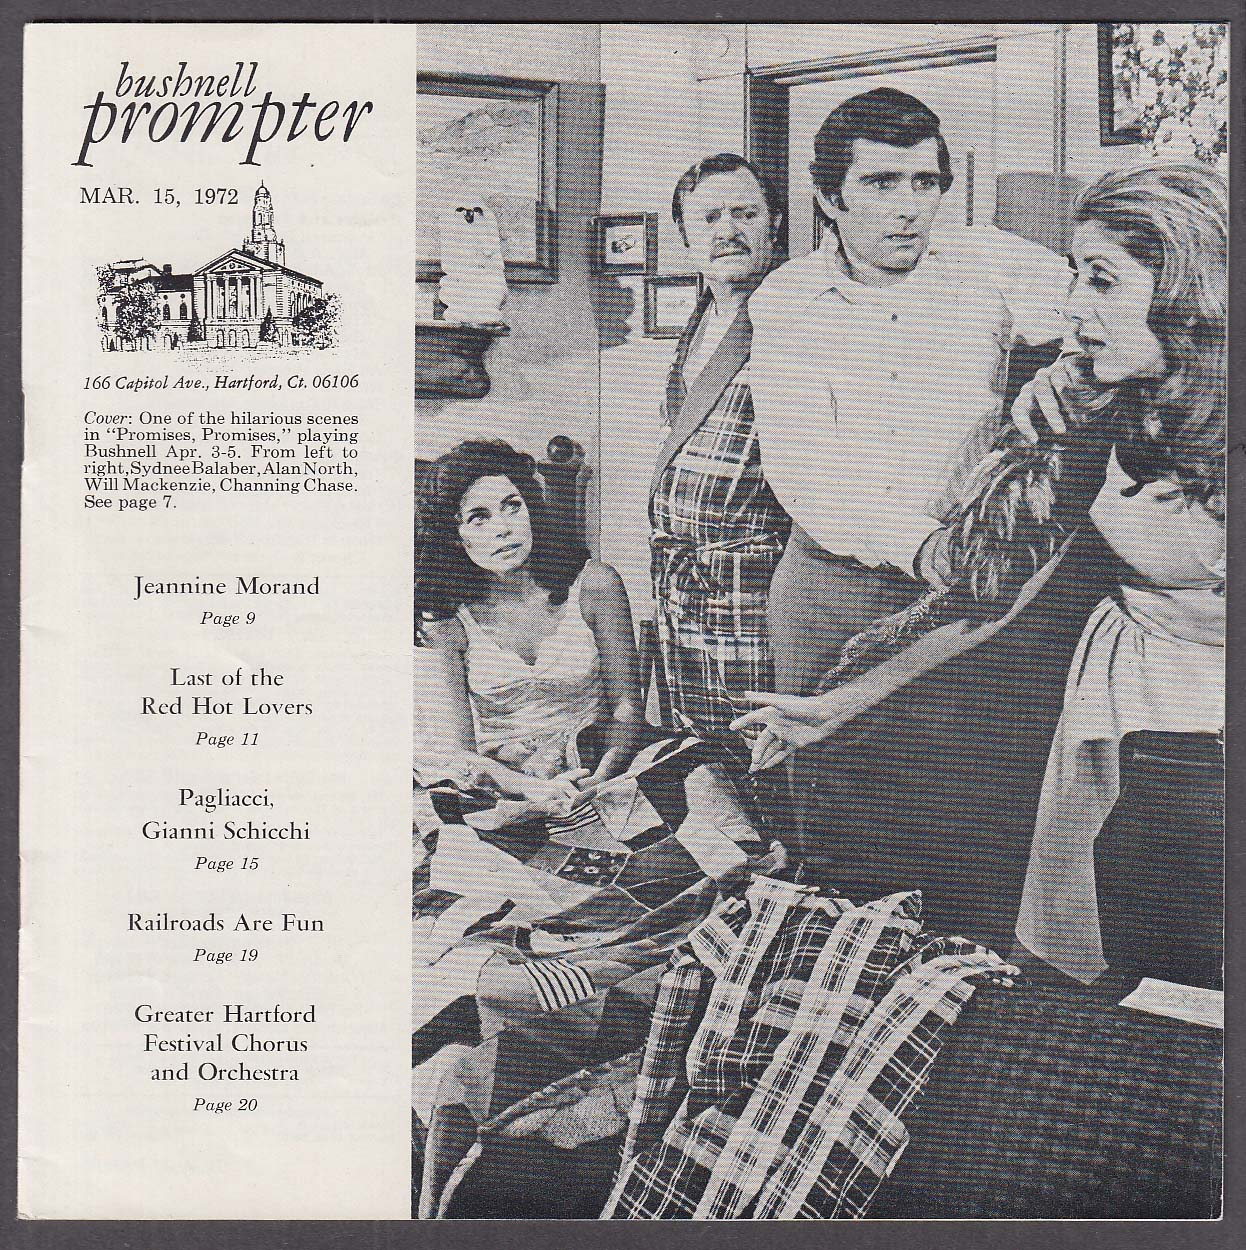 Jeannine Morand Stubby Kaye Bushnell Prompter 3/16 1972